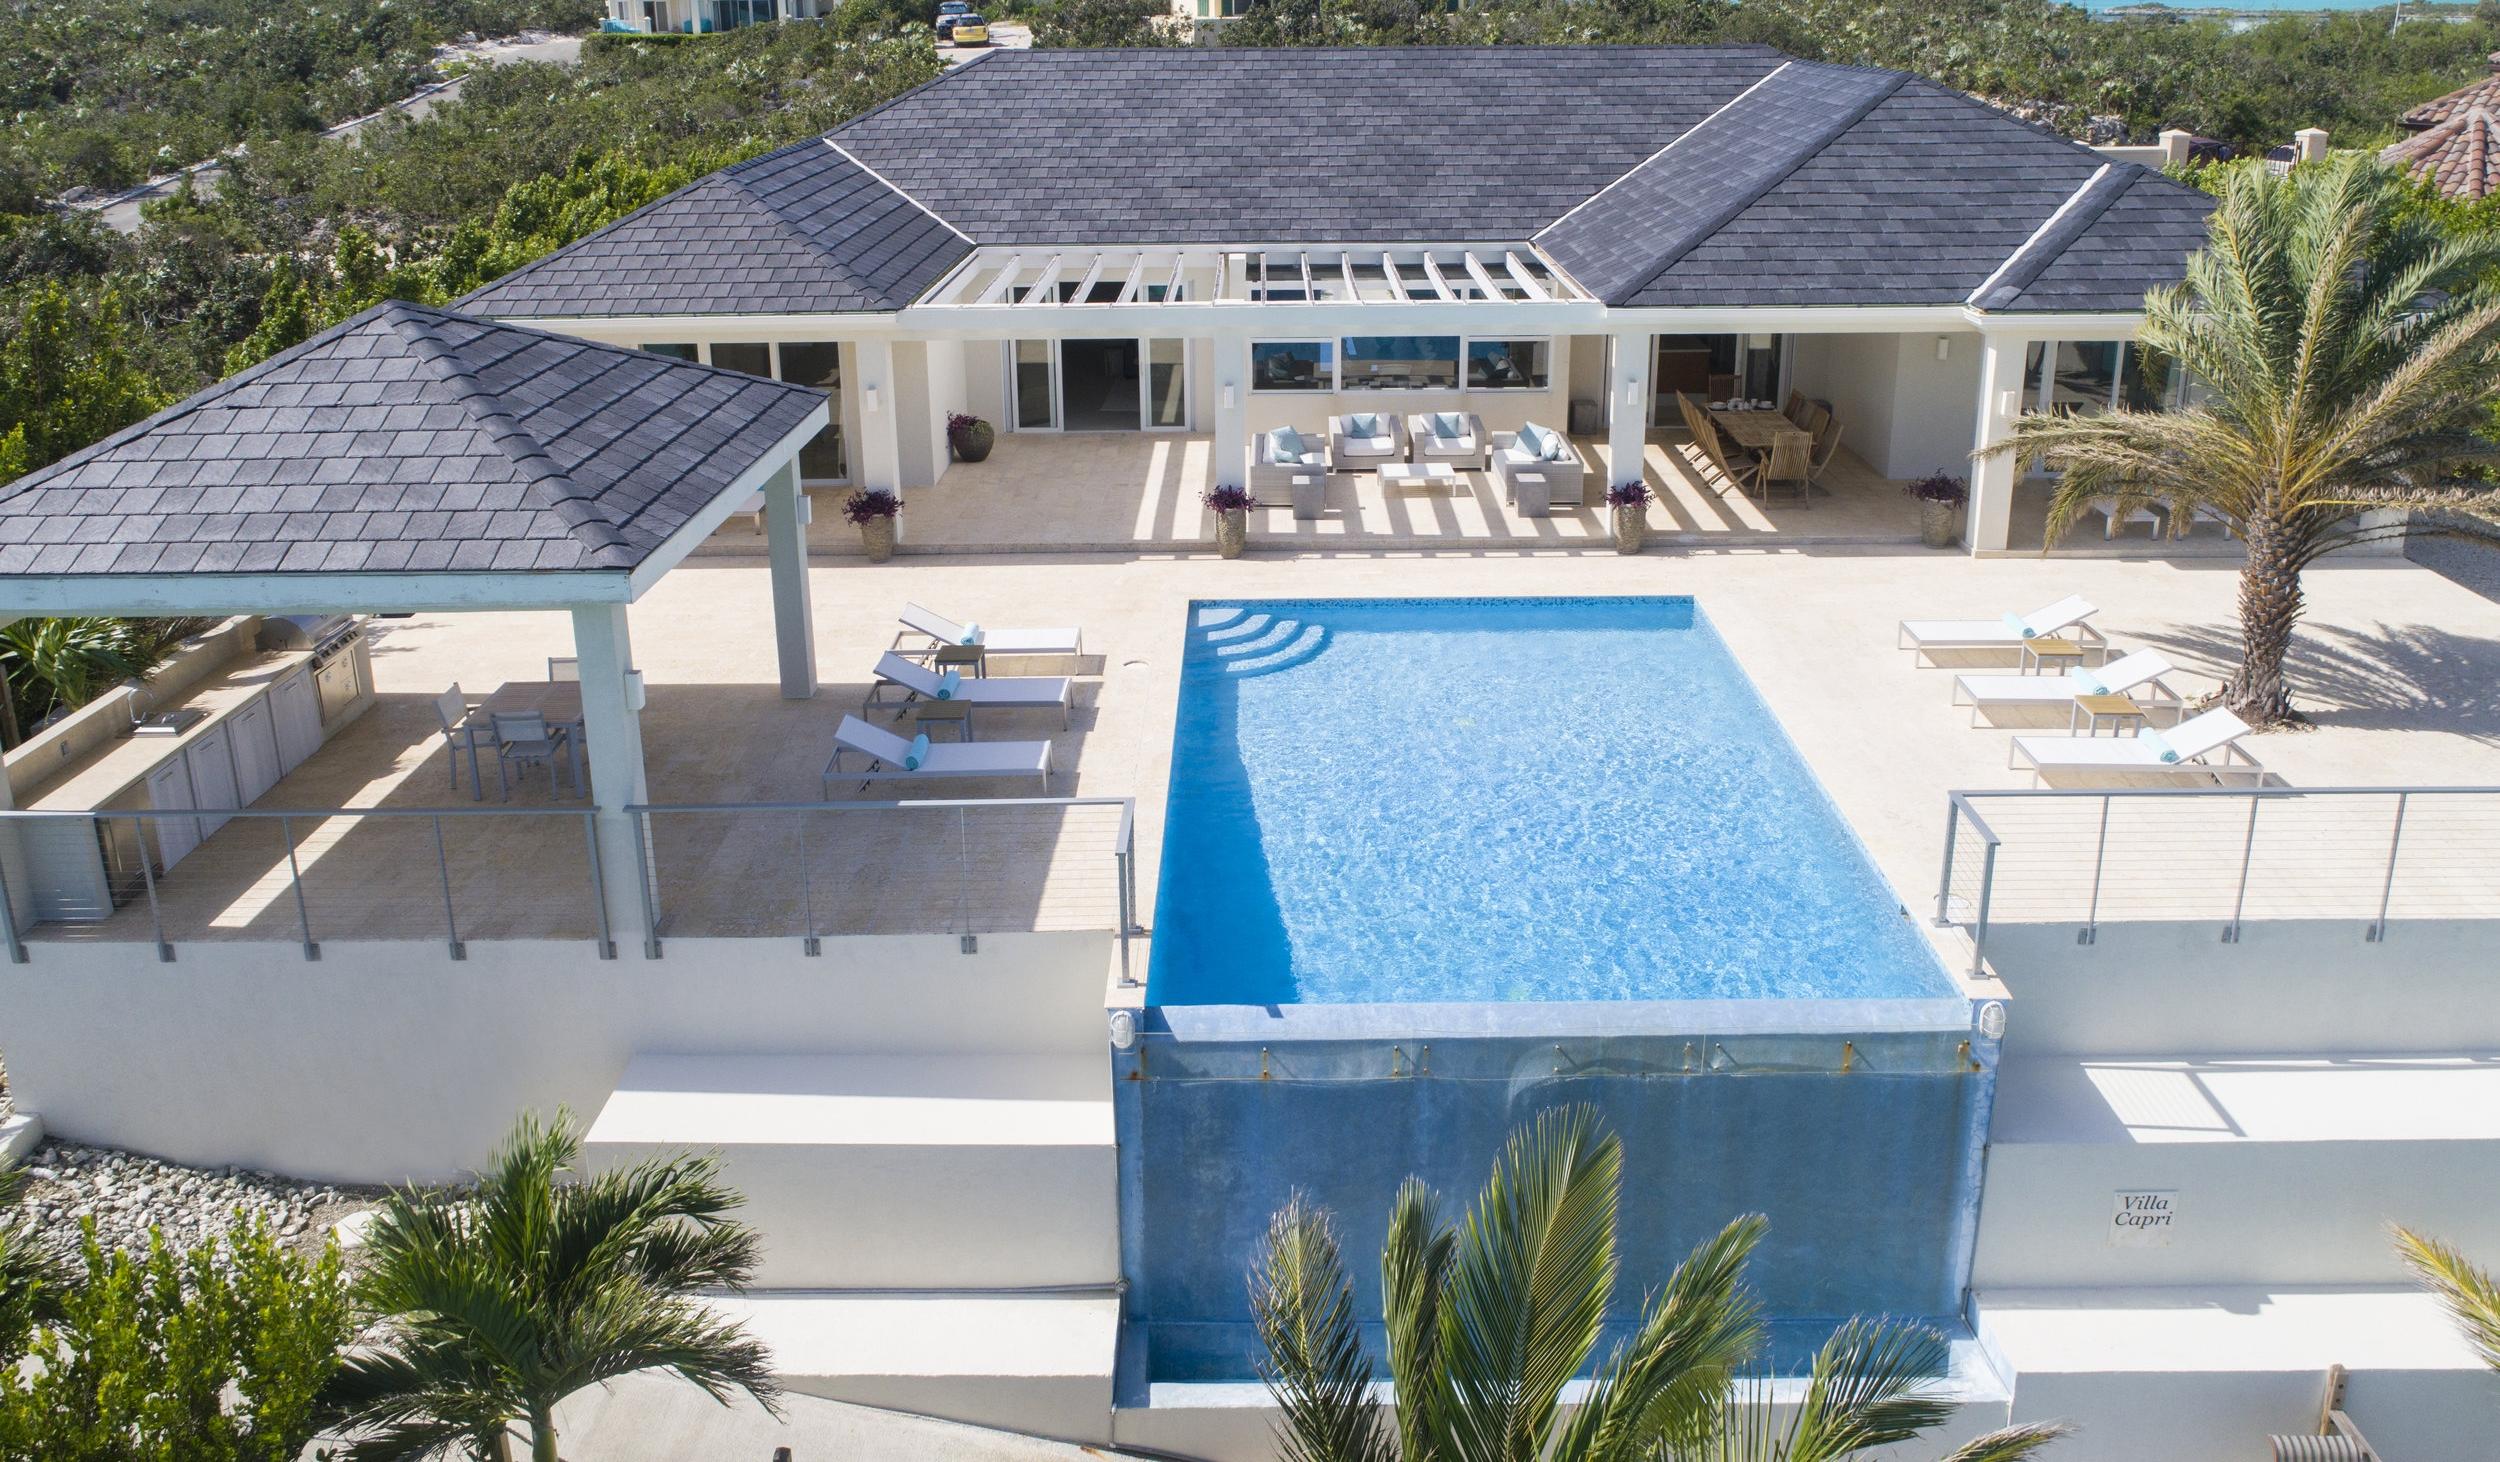 Villa Capri Turks and Caicos Aerial Back.jpg